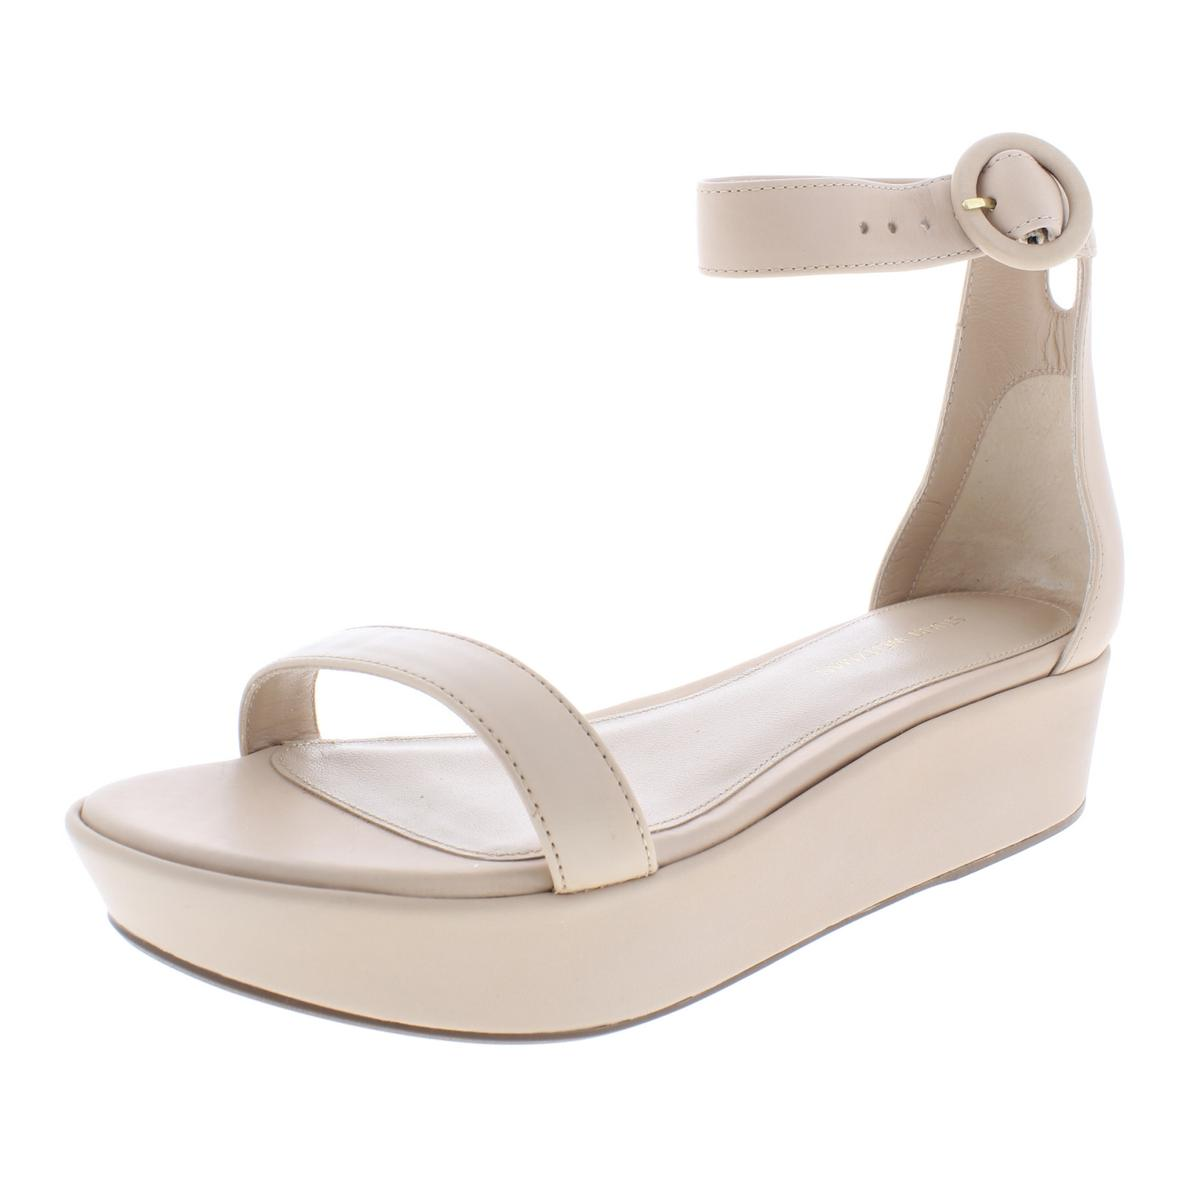 0af5ae642f68 Details about Stuart Weitzman Womens Capri Pink Platform Sandals 6 Medium  (B